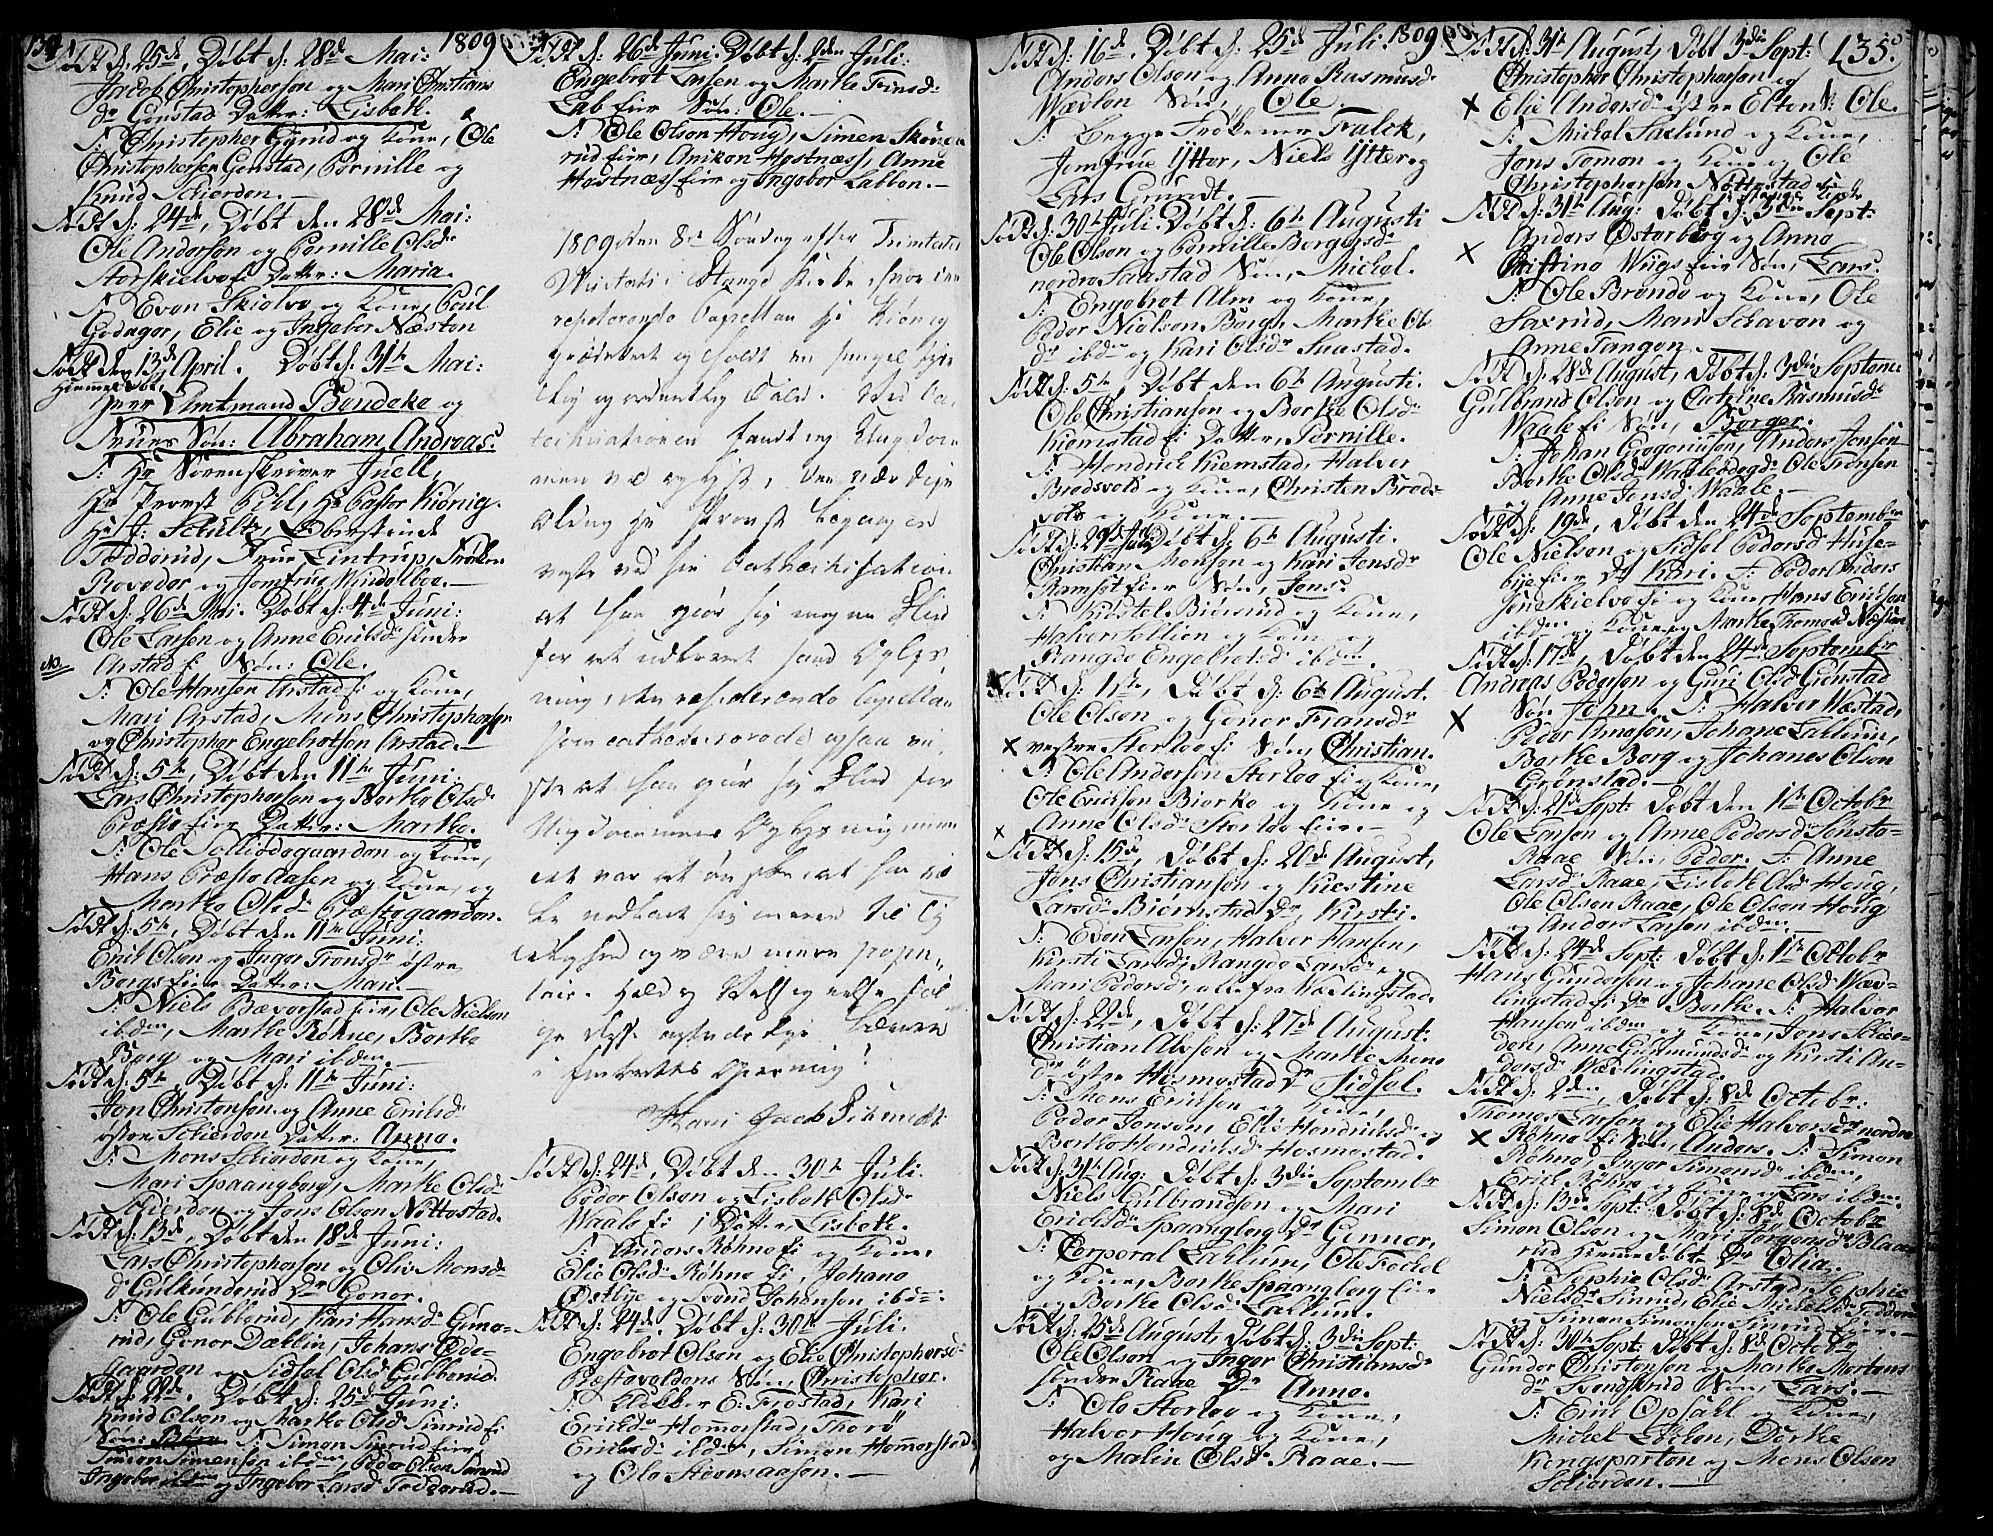 SAH, Stange prestekontor, K/L0007: Ministerialbok nr. 7, 1788-1813, s. 134-135